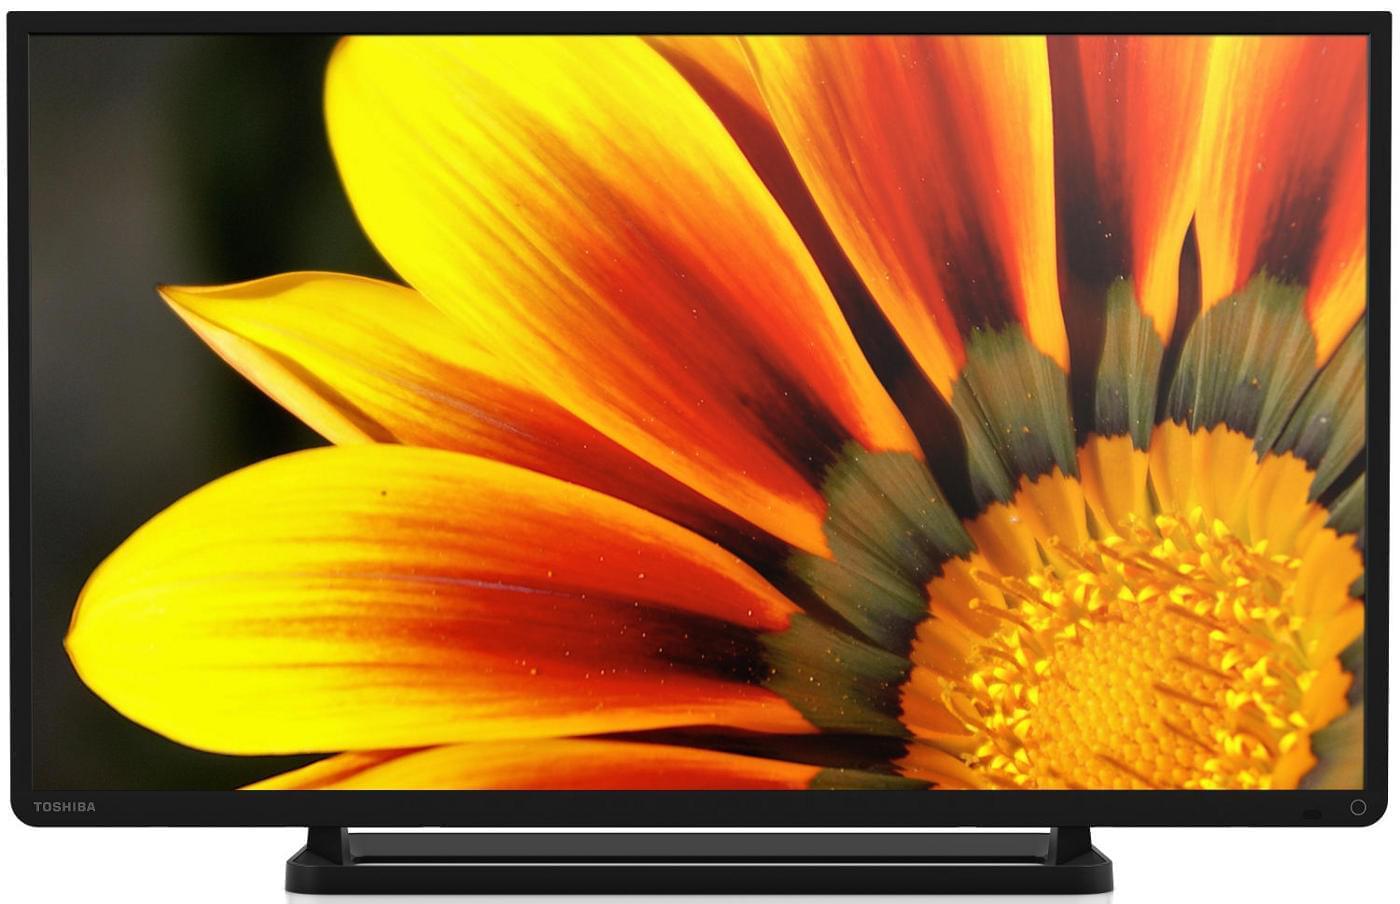 Toshiba 40L2433 (40L2433) - Achat / Vente TV sur Cybertek.fr - 0